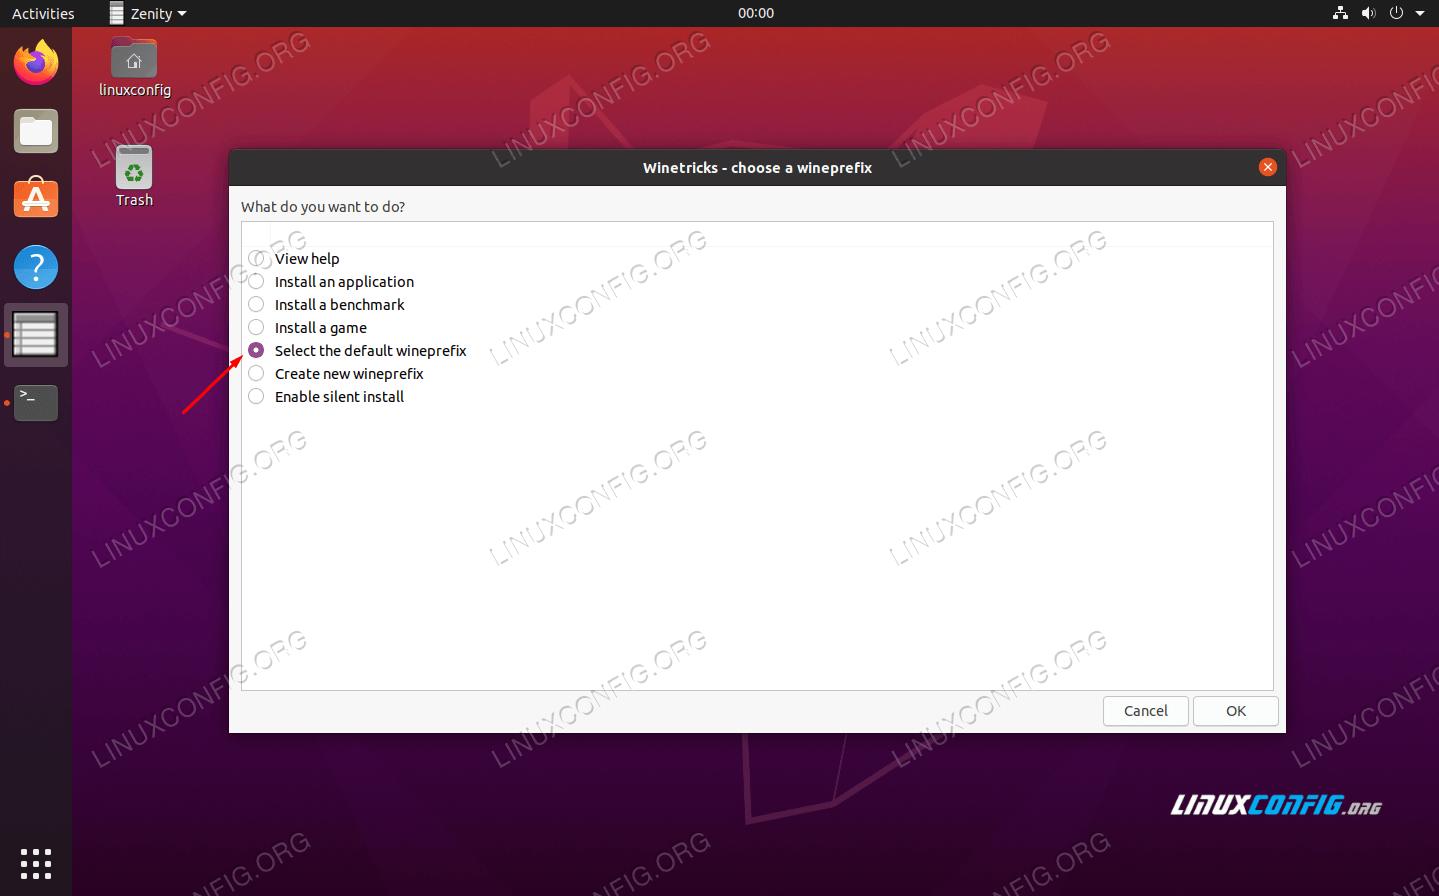 Select the default wineprefix